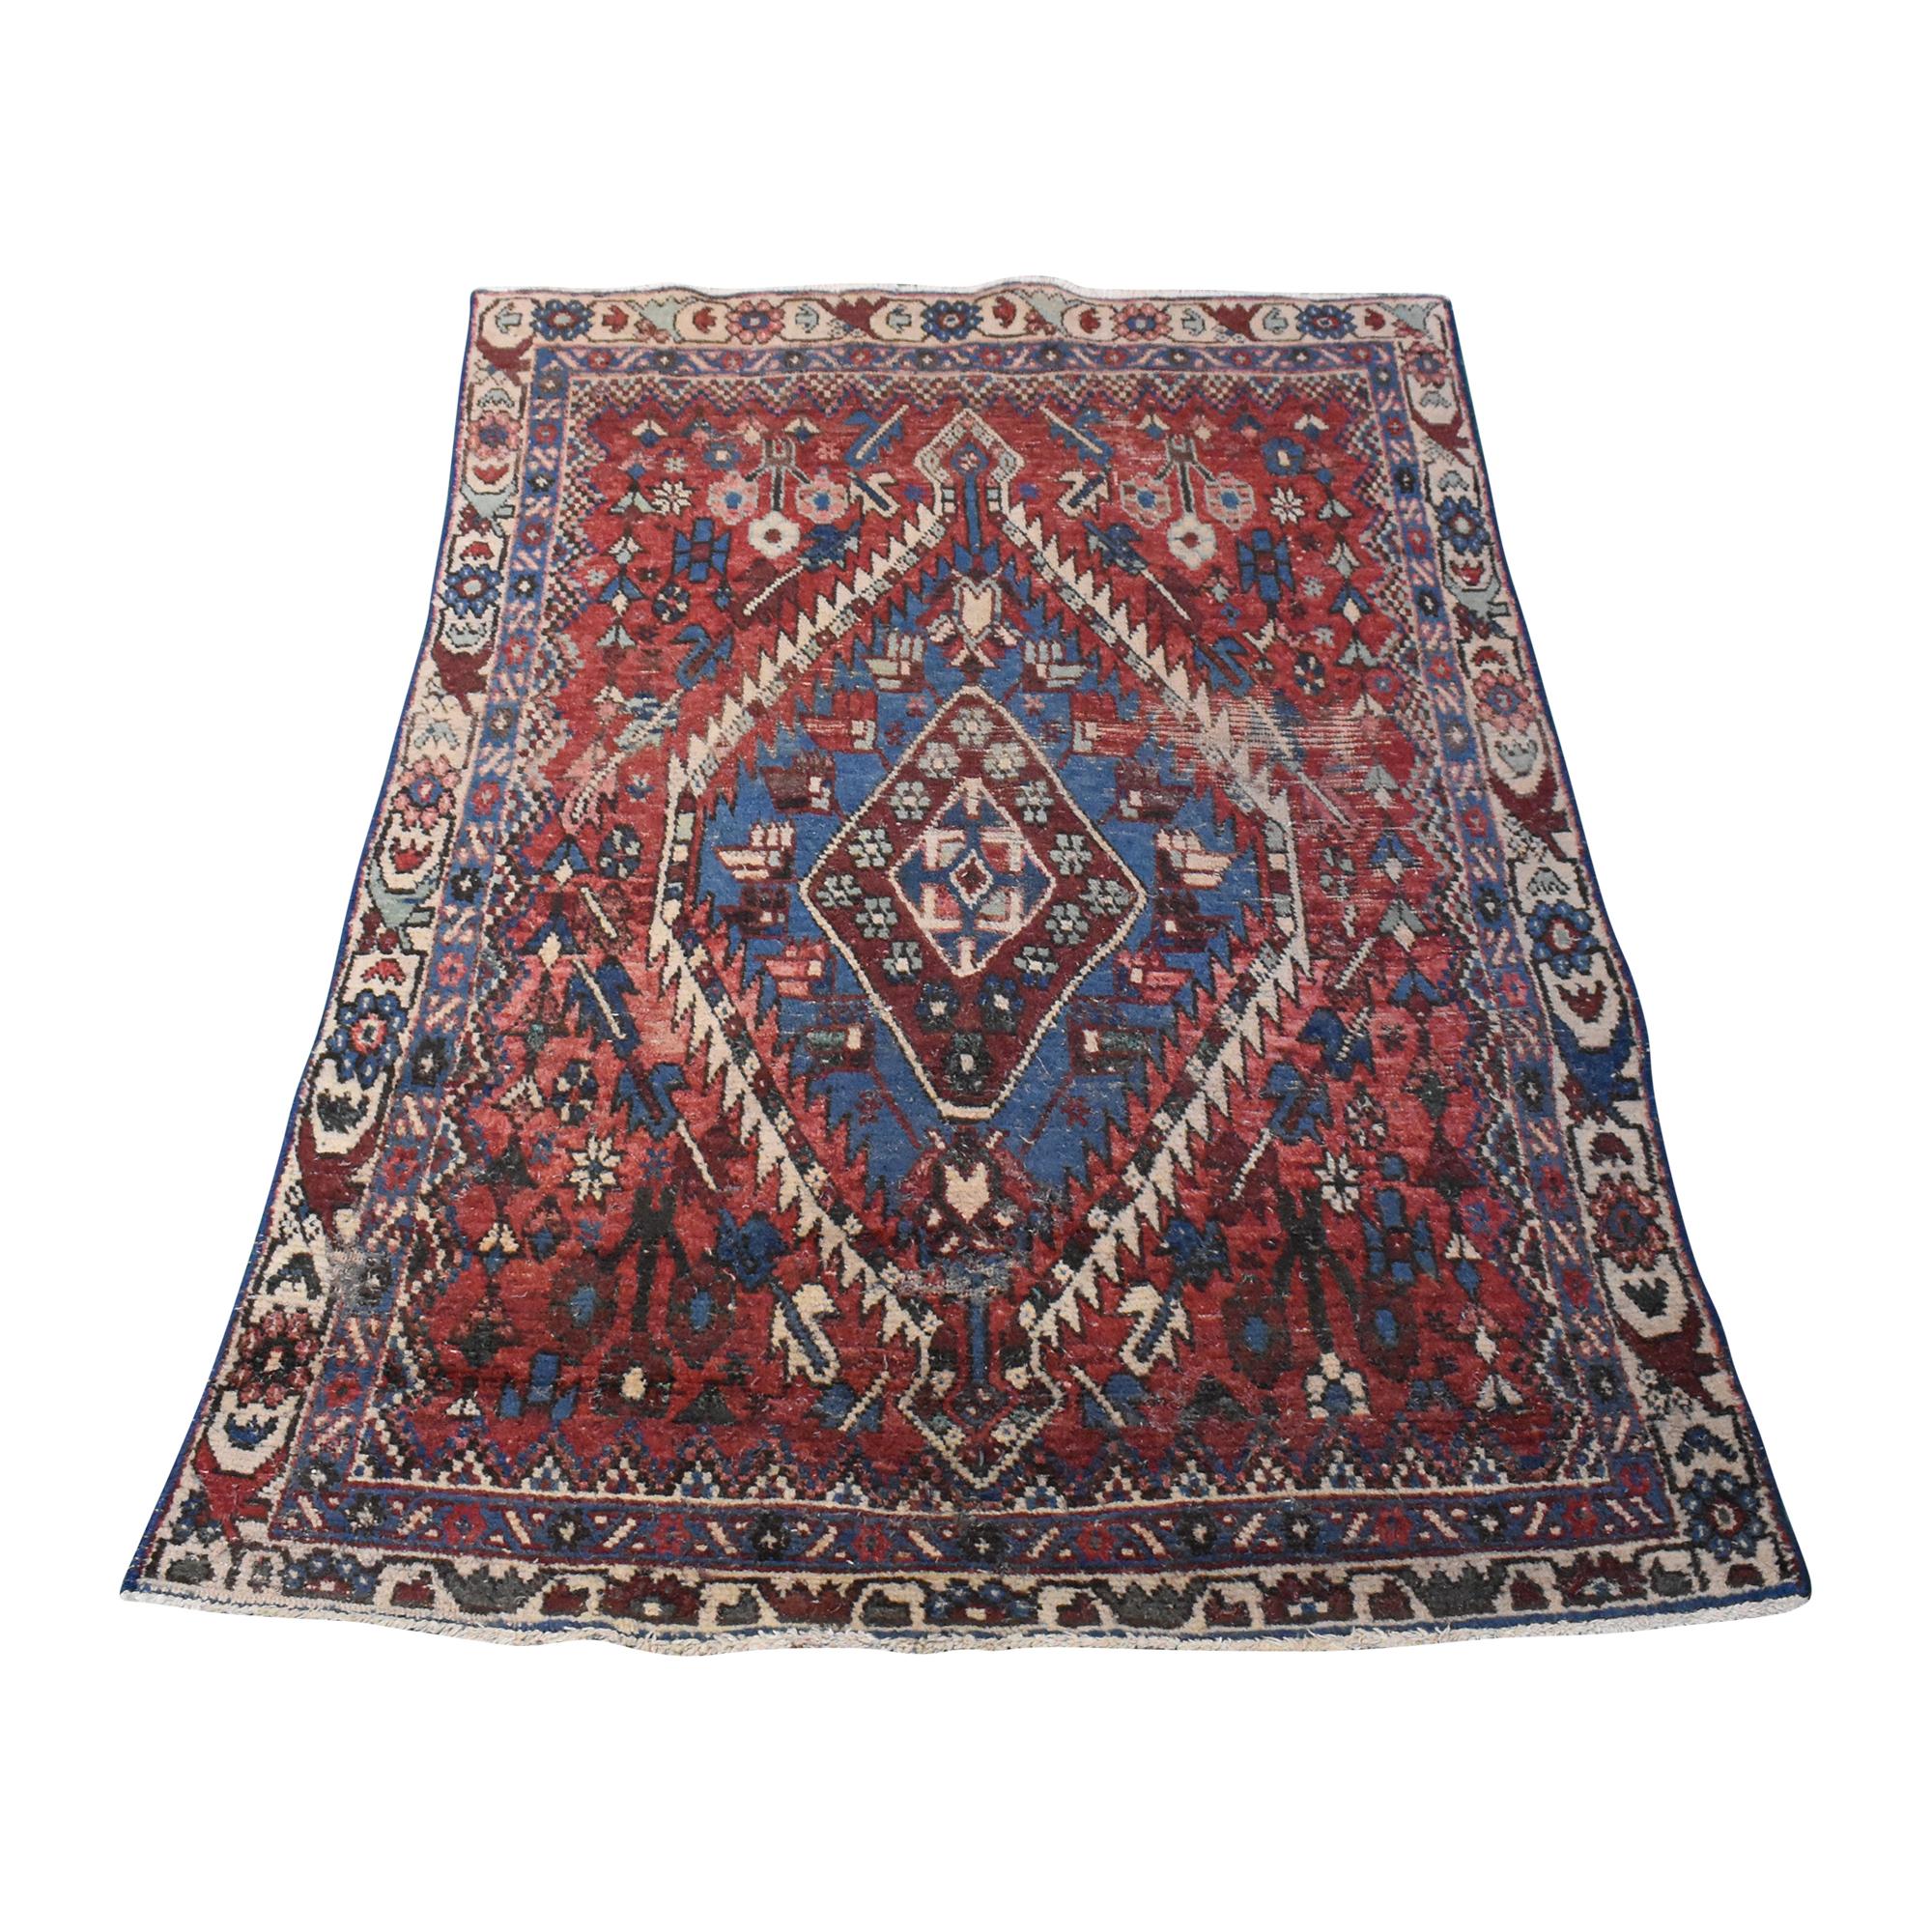 buy Bisar Persian-Style Area Rug